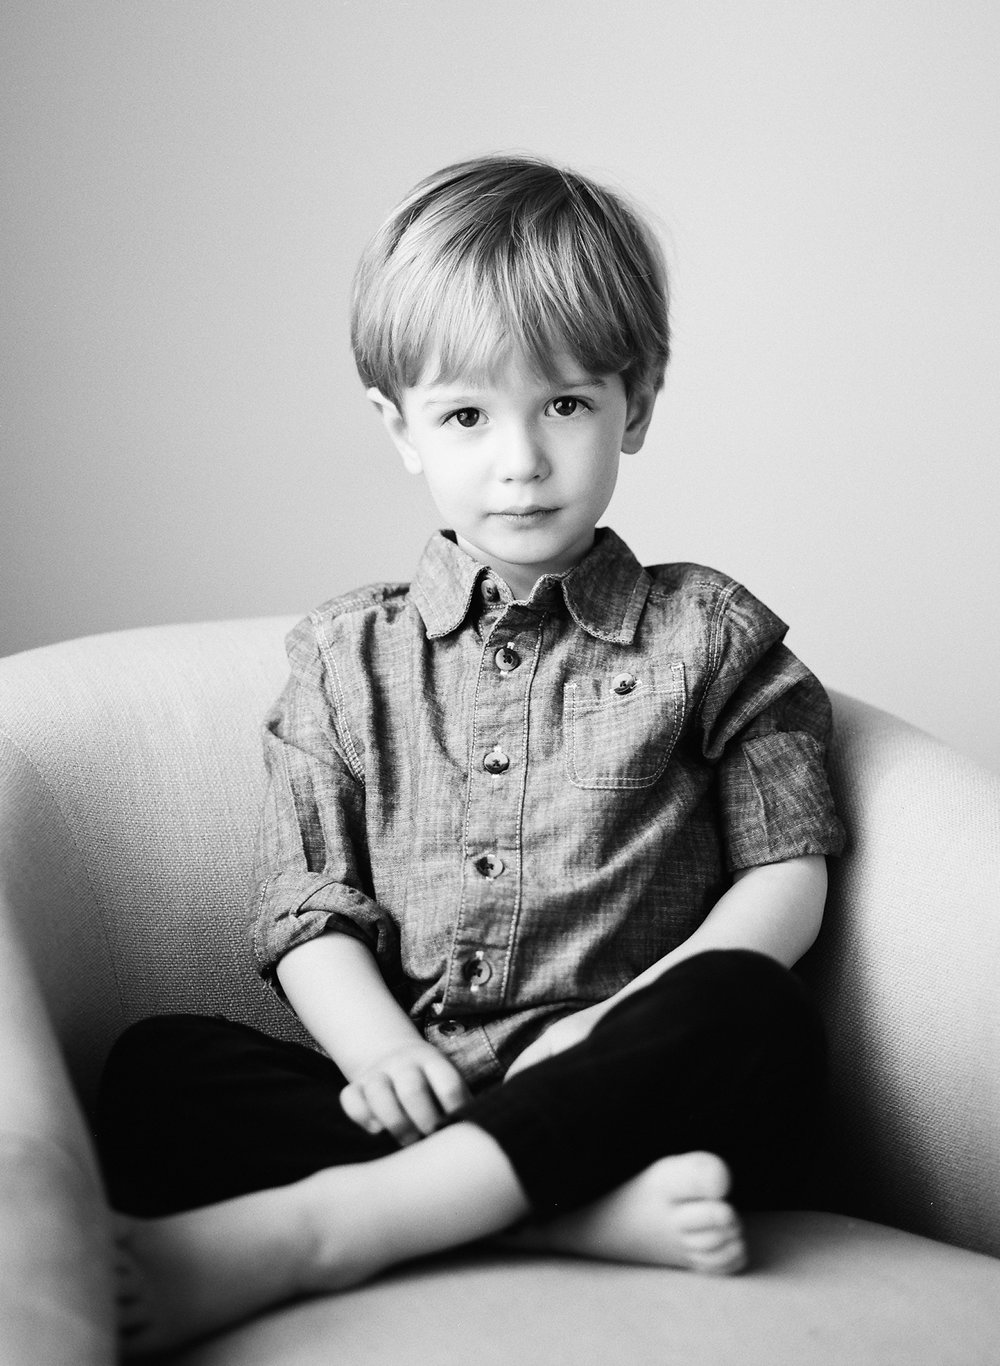 nashville-franklin-blackandwhite-childrens-portraiture-16.JPG